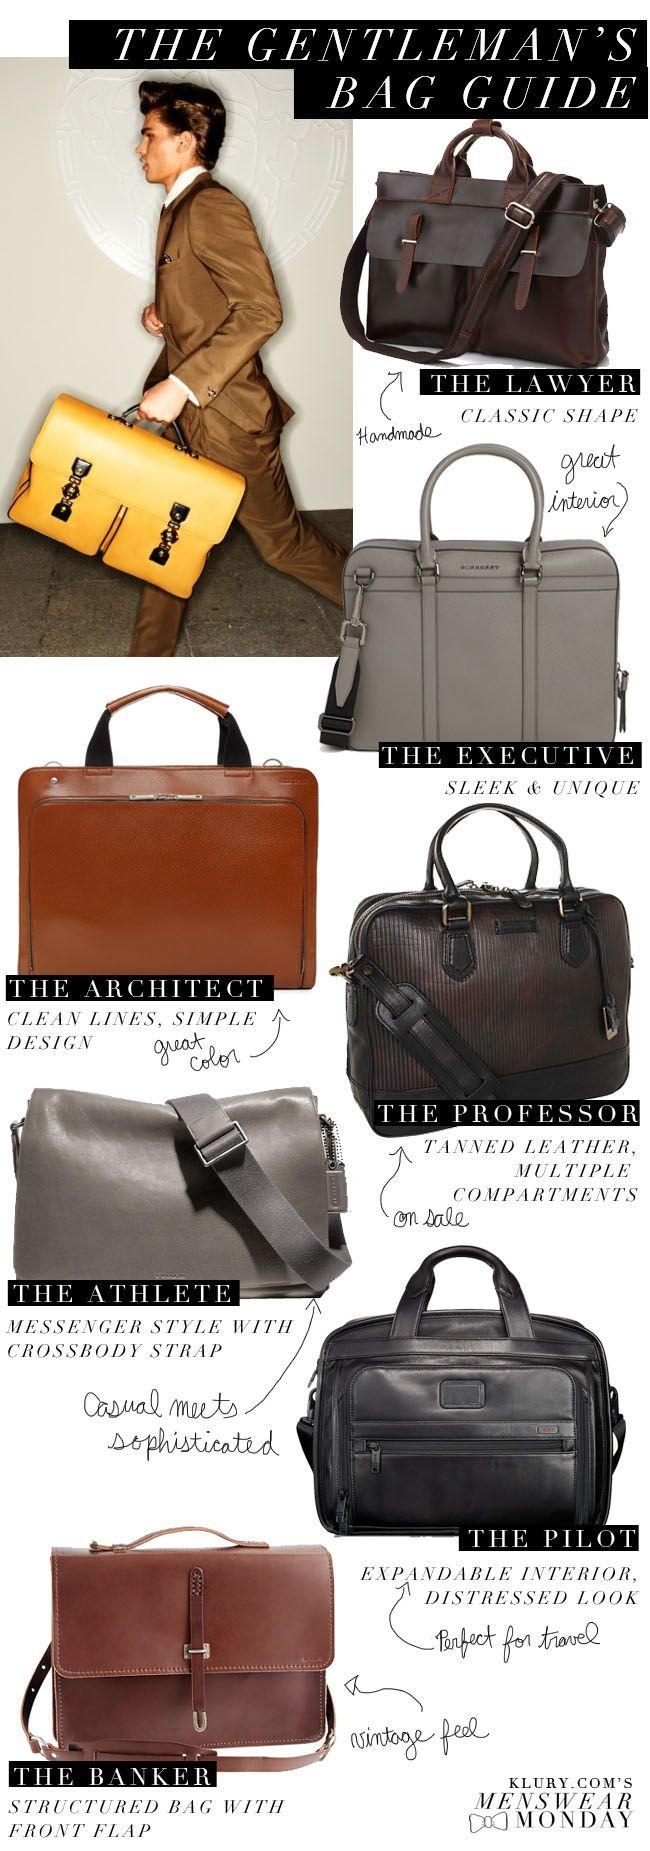 Klury.coms Menswear Monday: The Gentleman Bag Guide